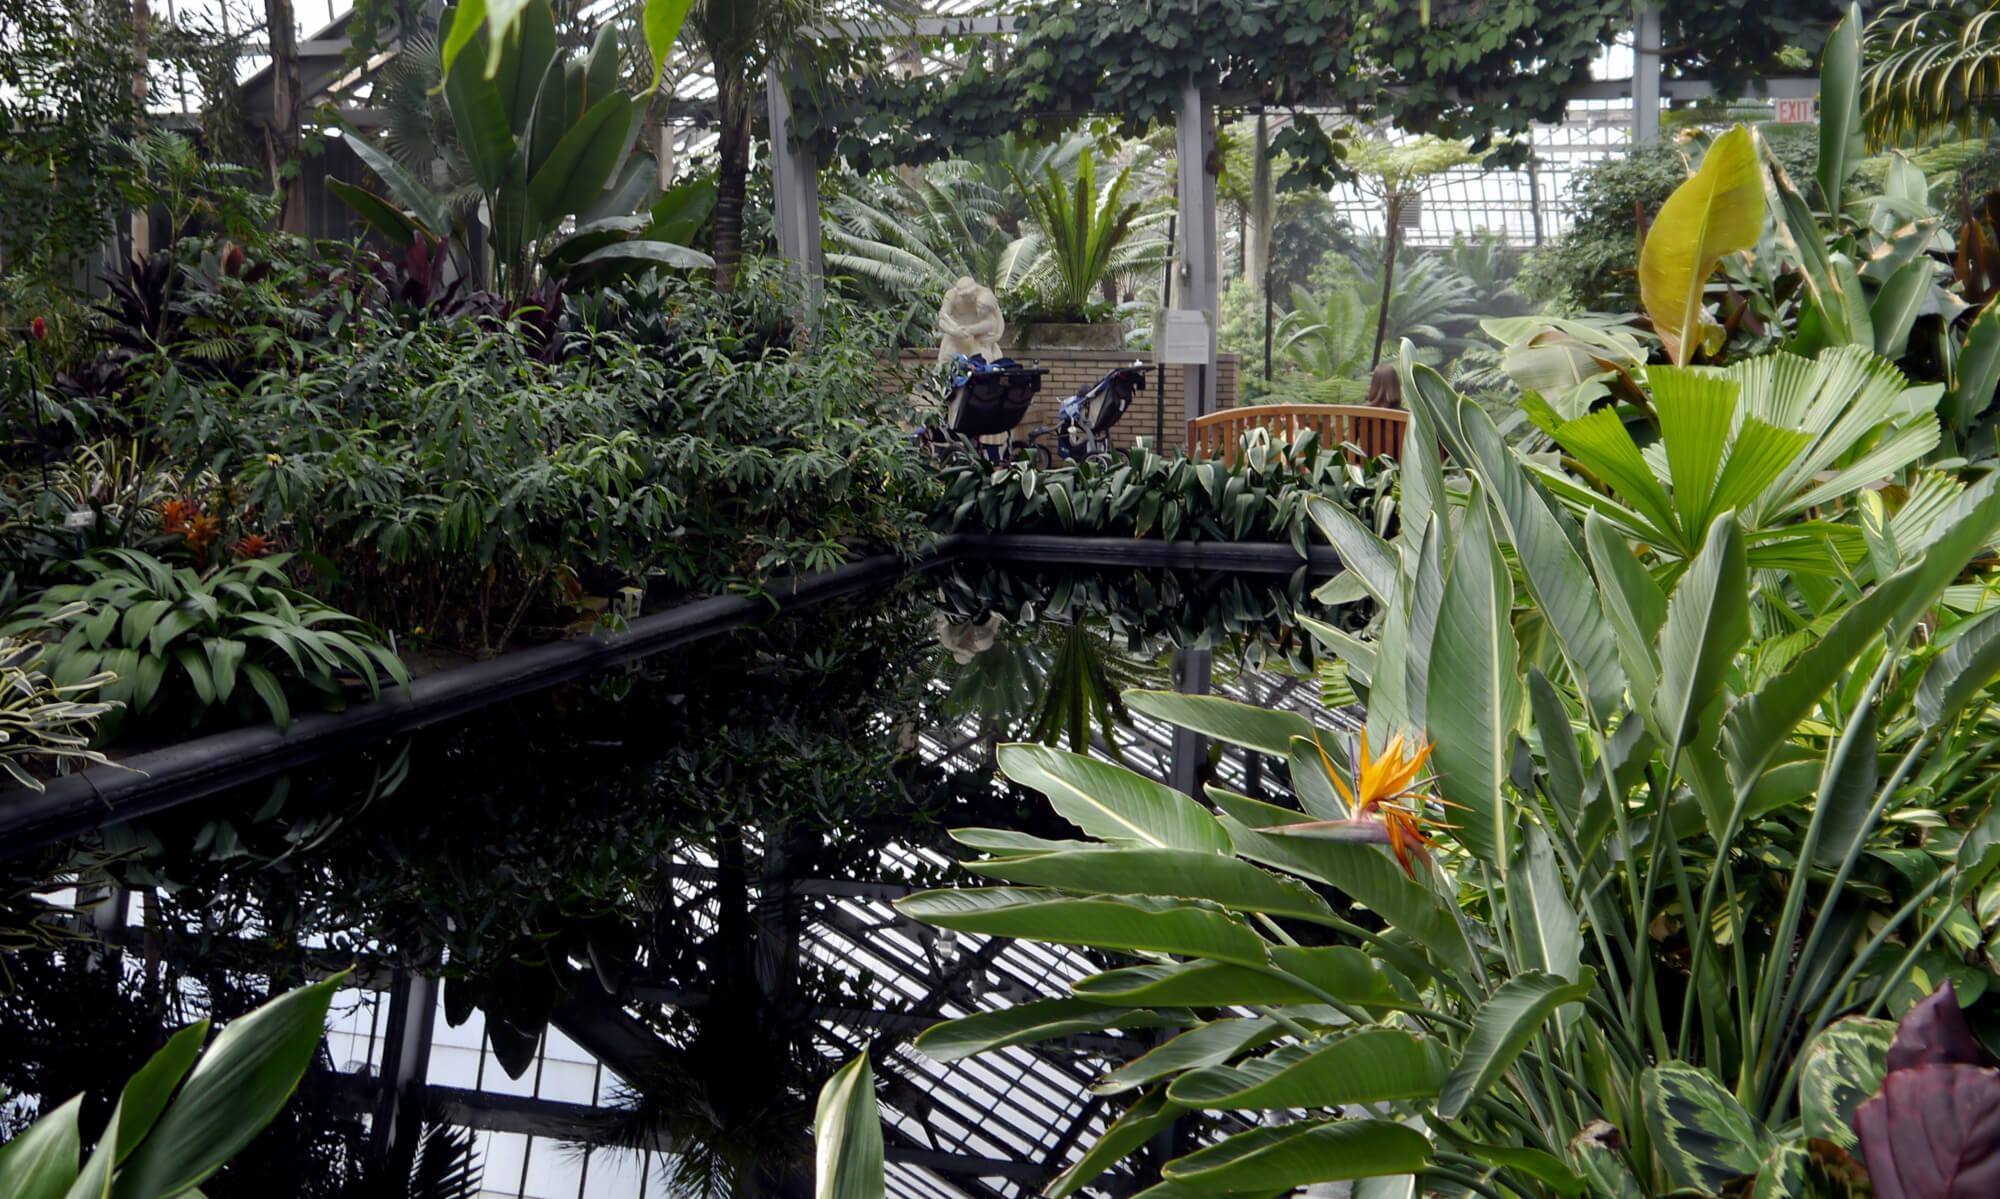 garfield park conservatory in chicago